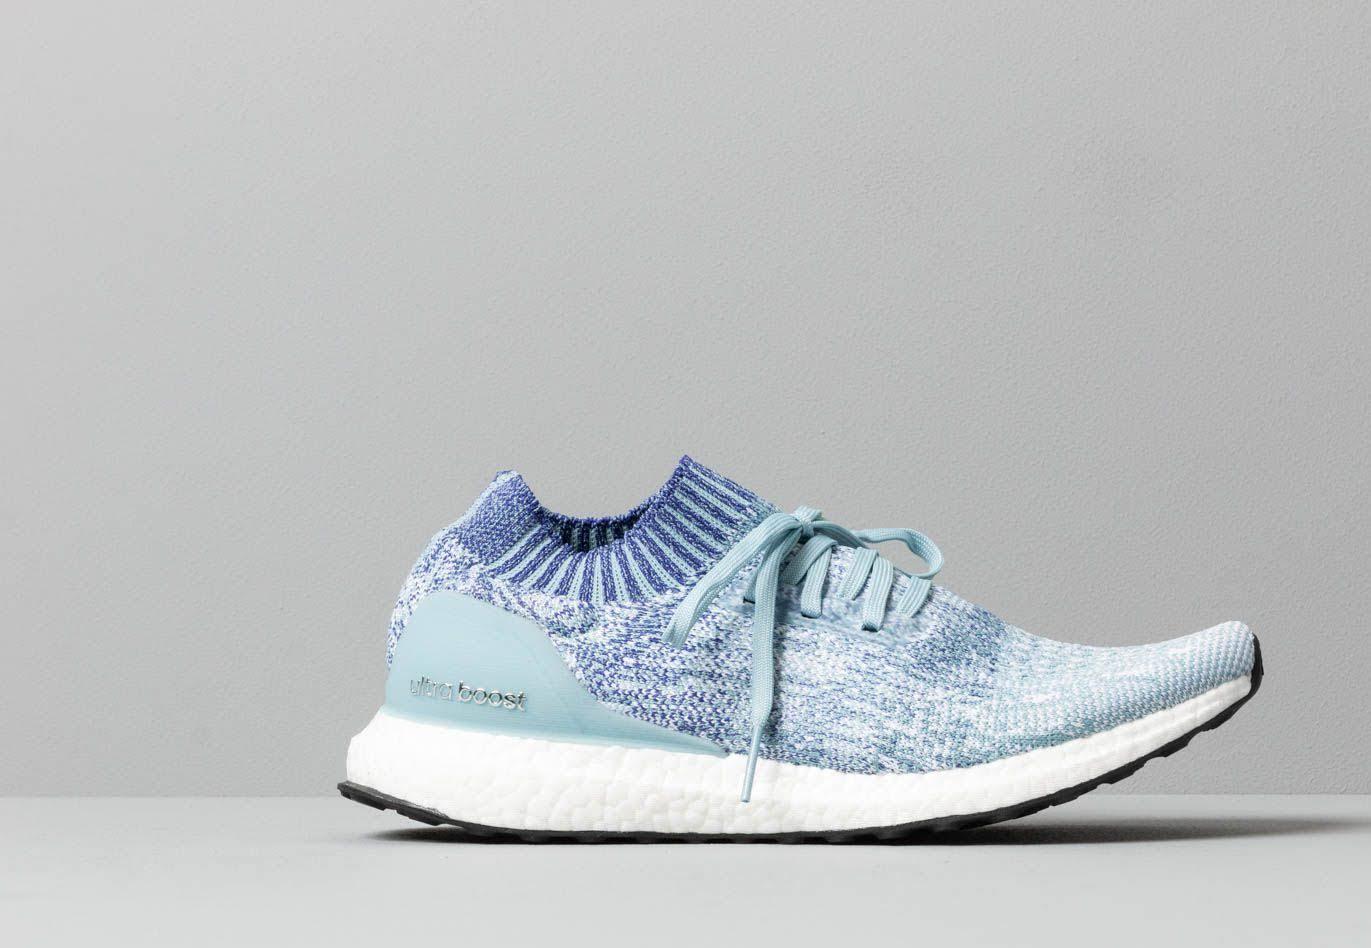 Adidas Us Uncaged Ultraboost AshgreyActiveblue 10 Shockred N8vnw0mO